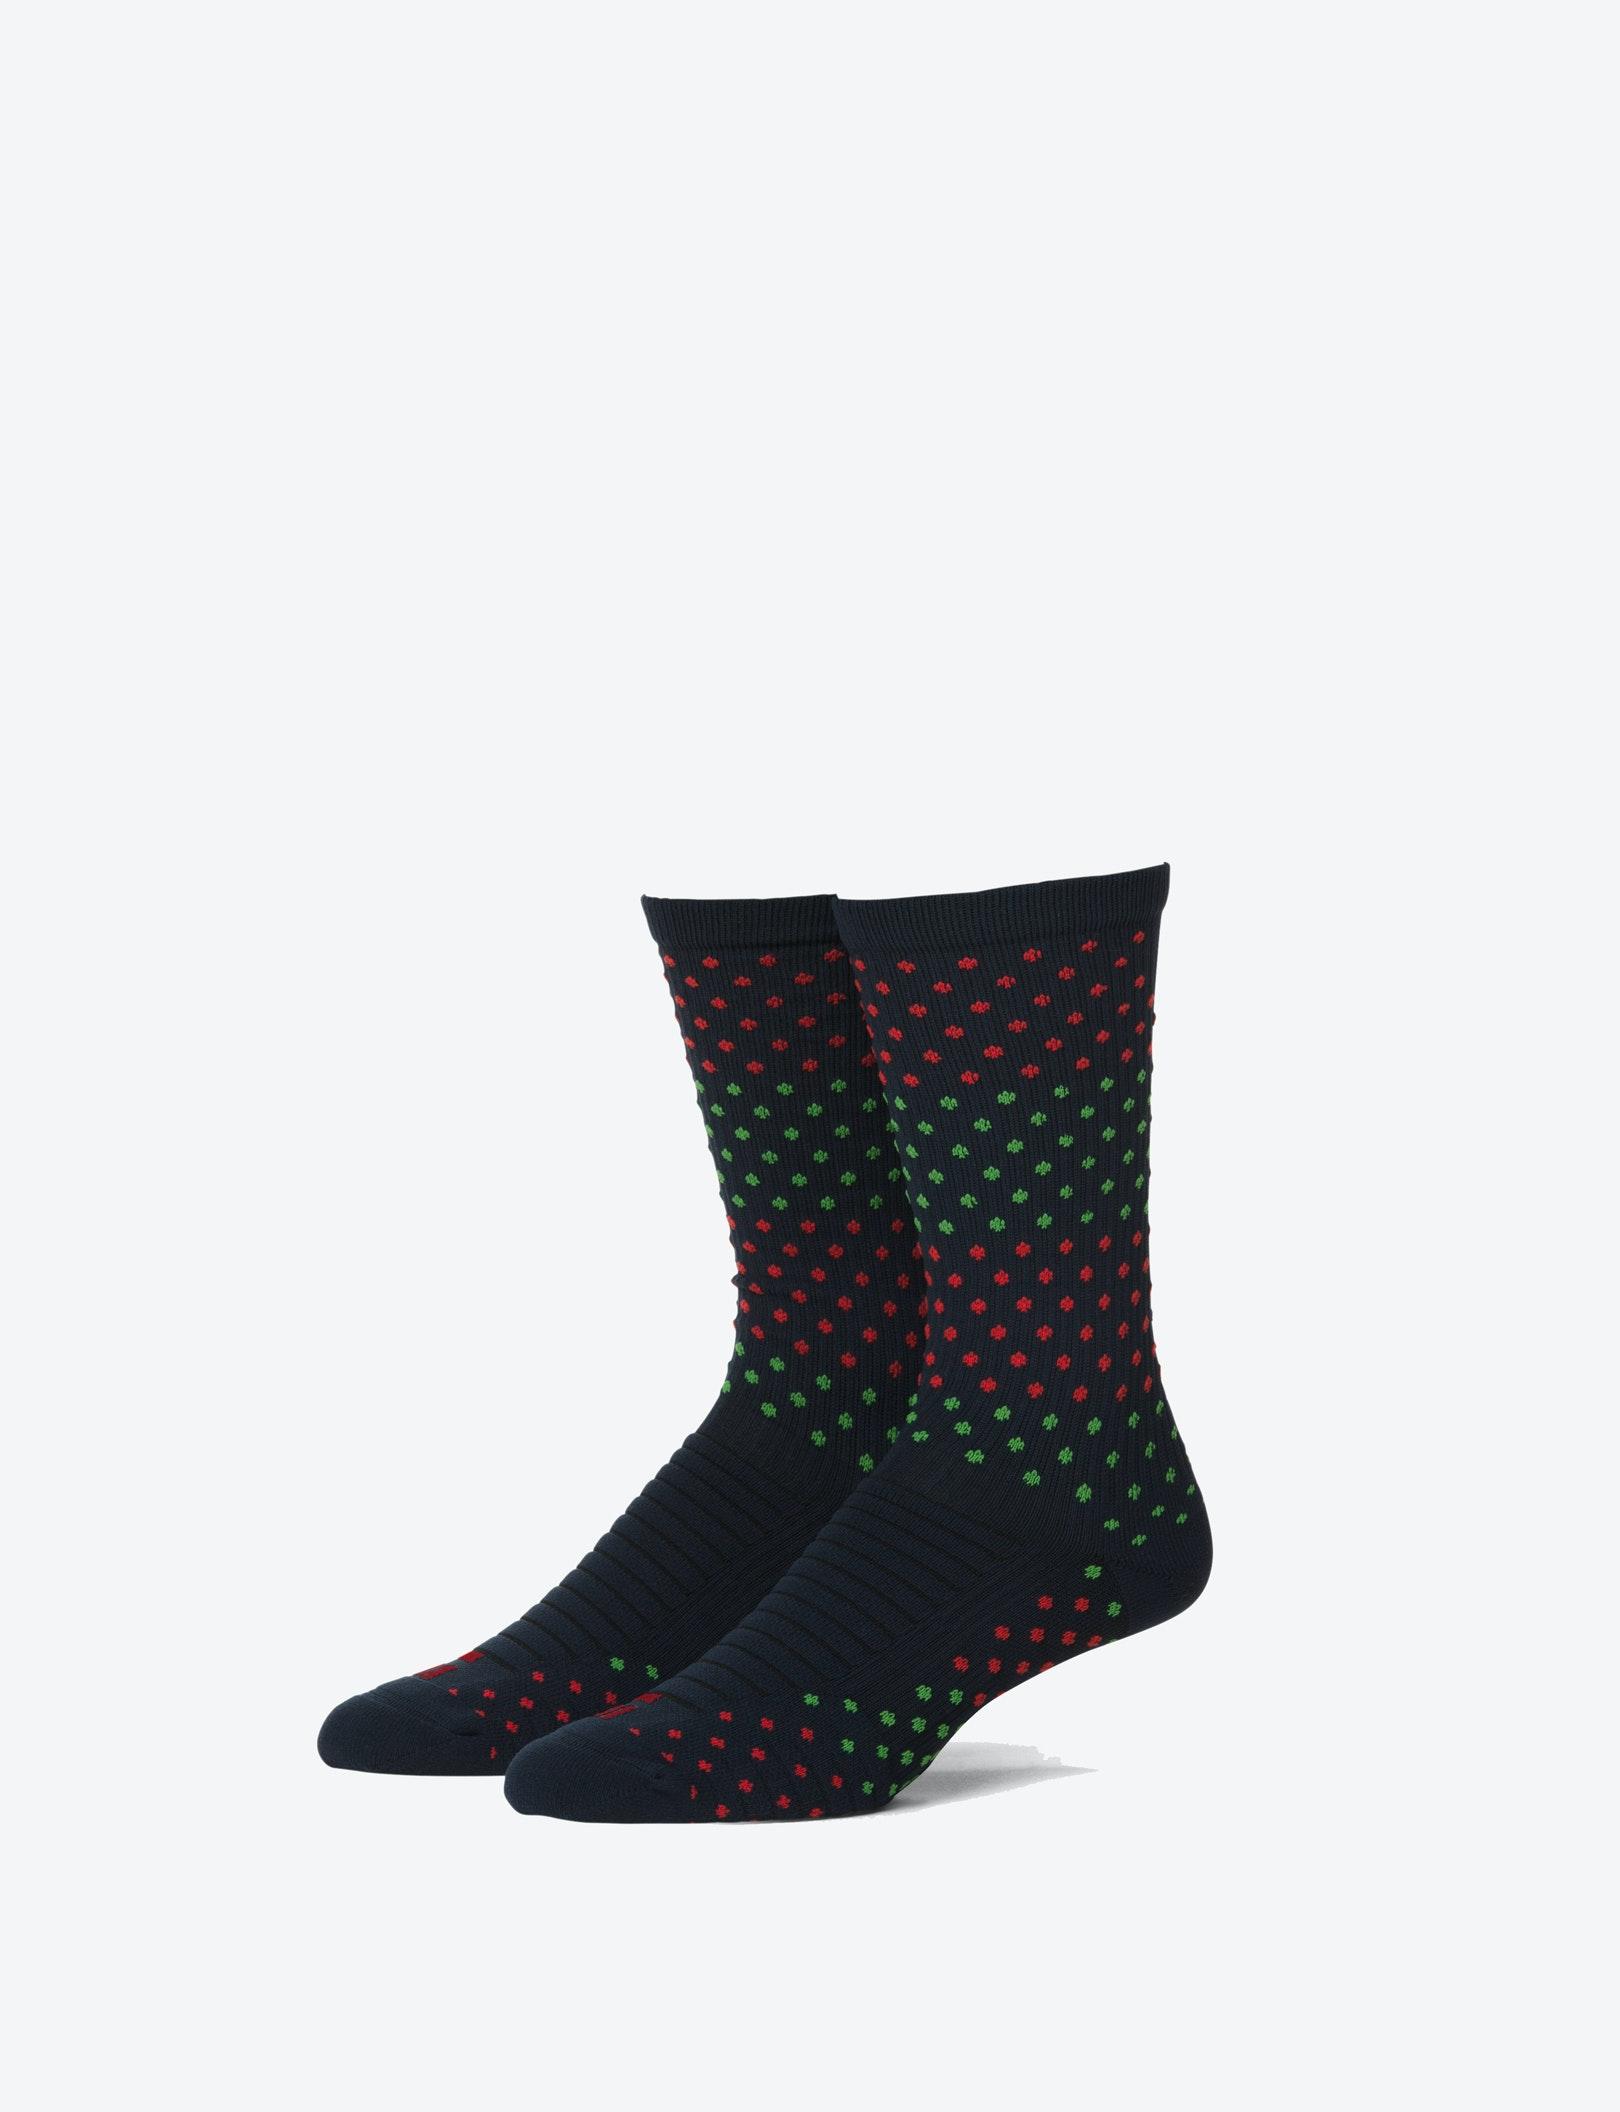 Holiday Edition Performance Dress Sock